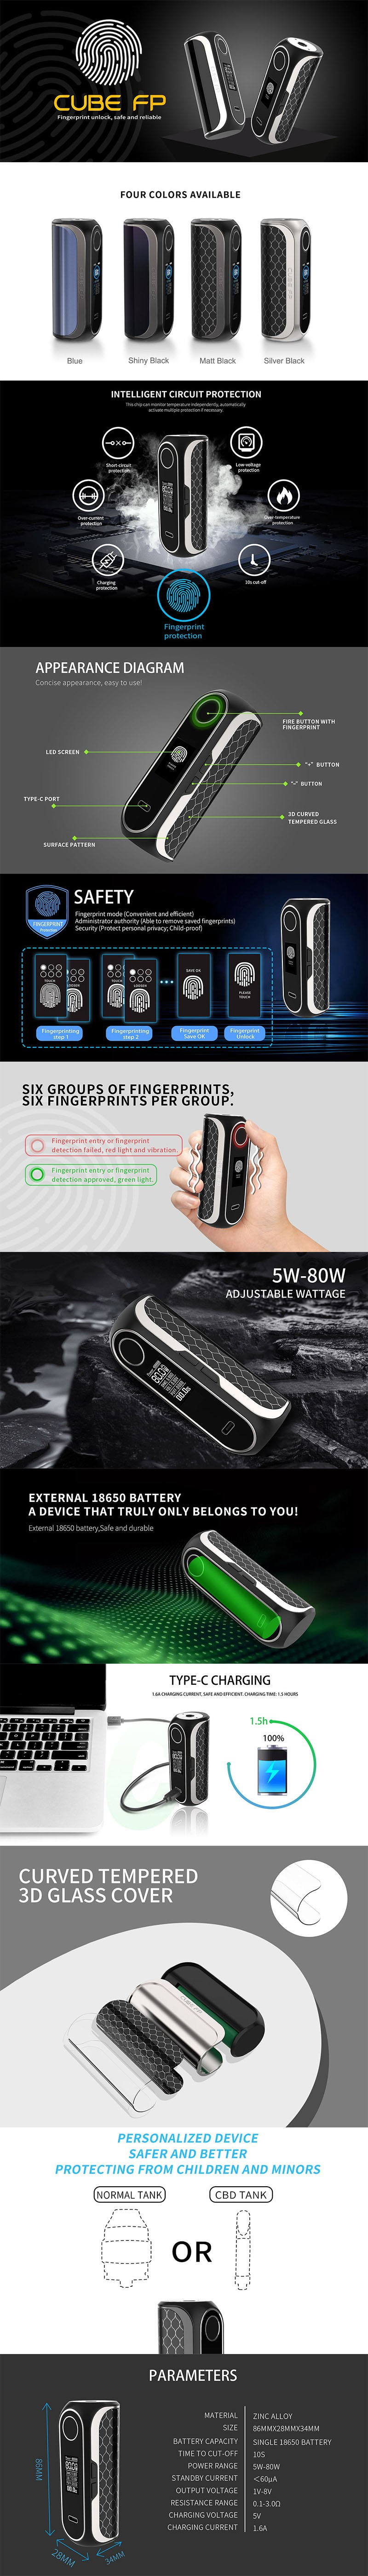 OBS Cube FP Fingerprint Unlock 80W VW Box Vape Mod Kit w/ Cube Tank